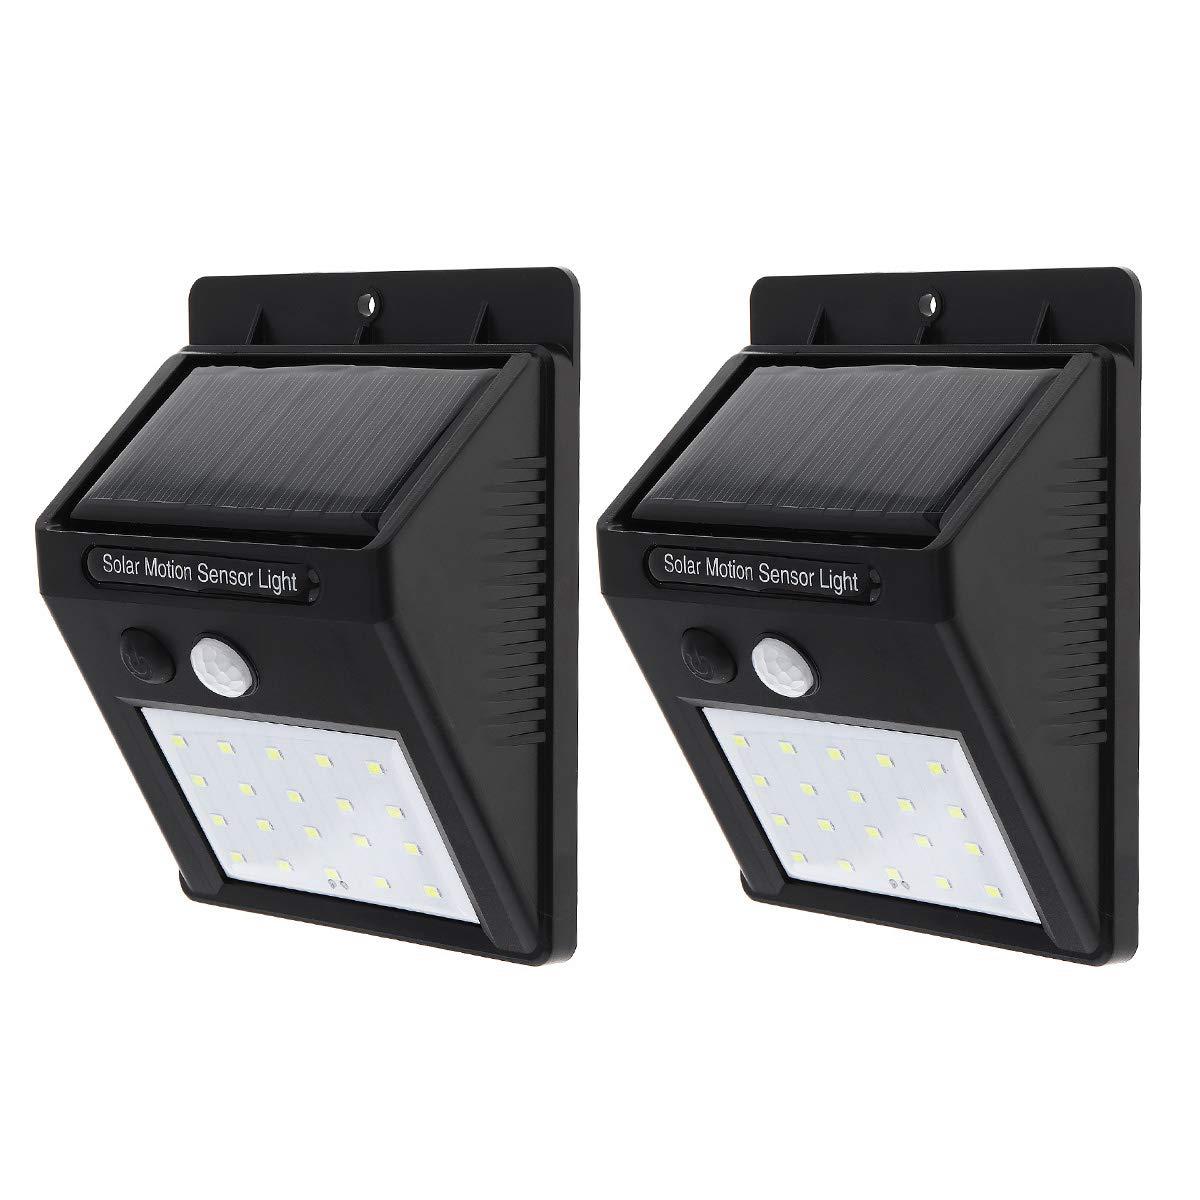 SecurityIng 20 LEDs Solar Power Wall Light, Waterproof PIR Motion Sensor Security Wireless Outdoor Light for Patio, Deck, Yard, Garden, Driveway, Outside Steps (2 Pack)